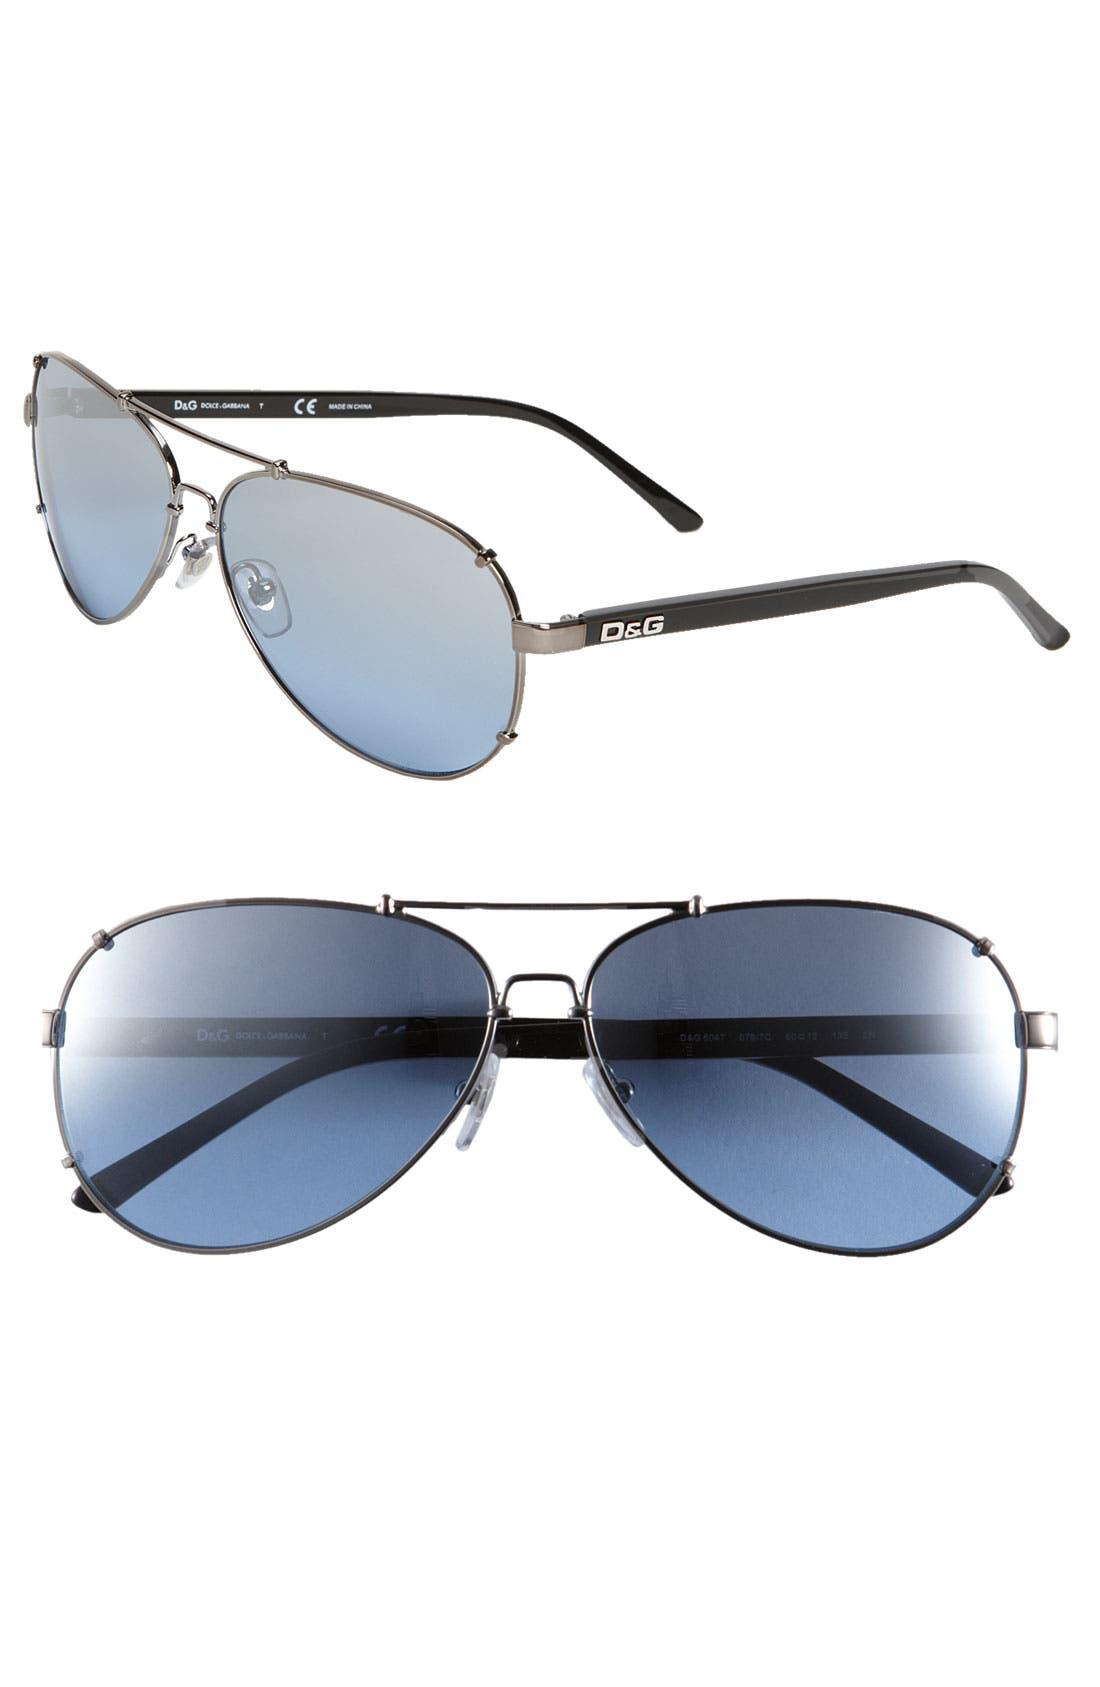 Main Image - D&G Metal Aviator Sunglasses